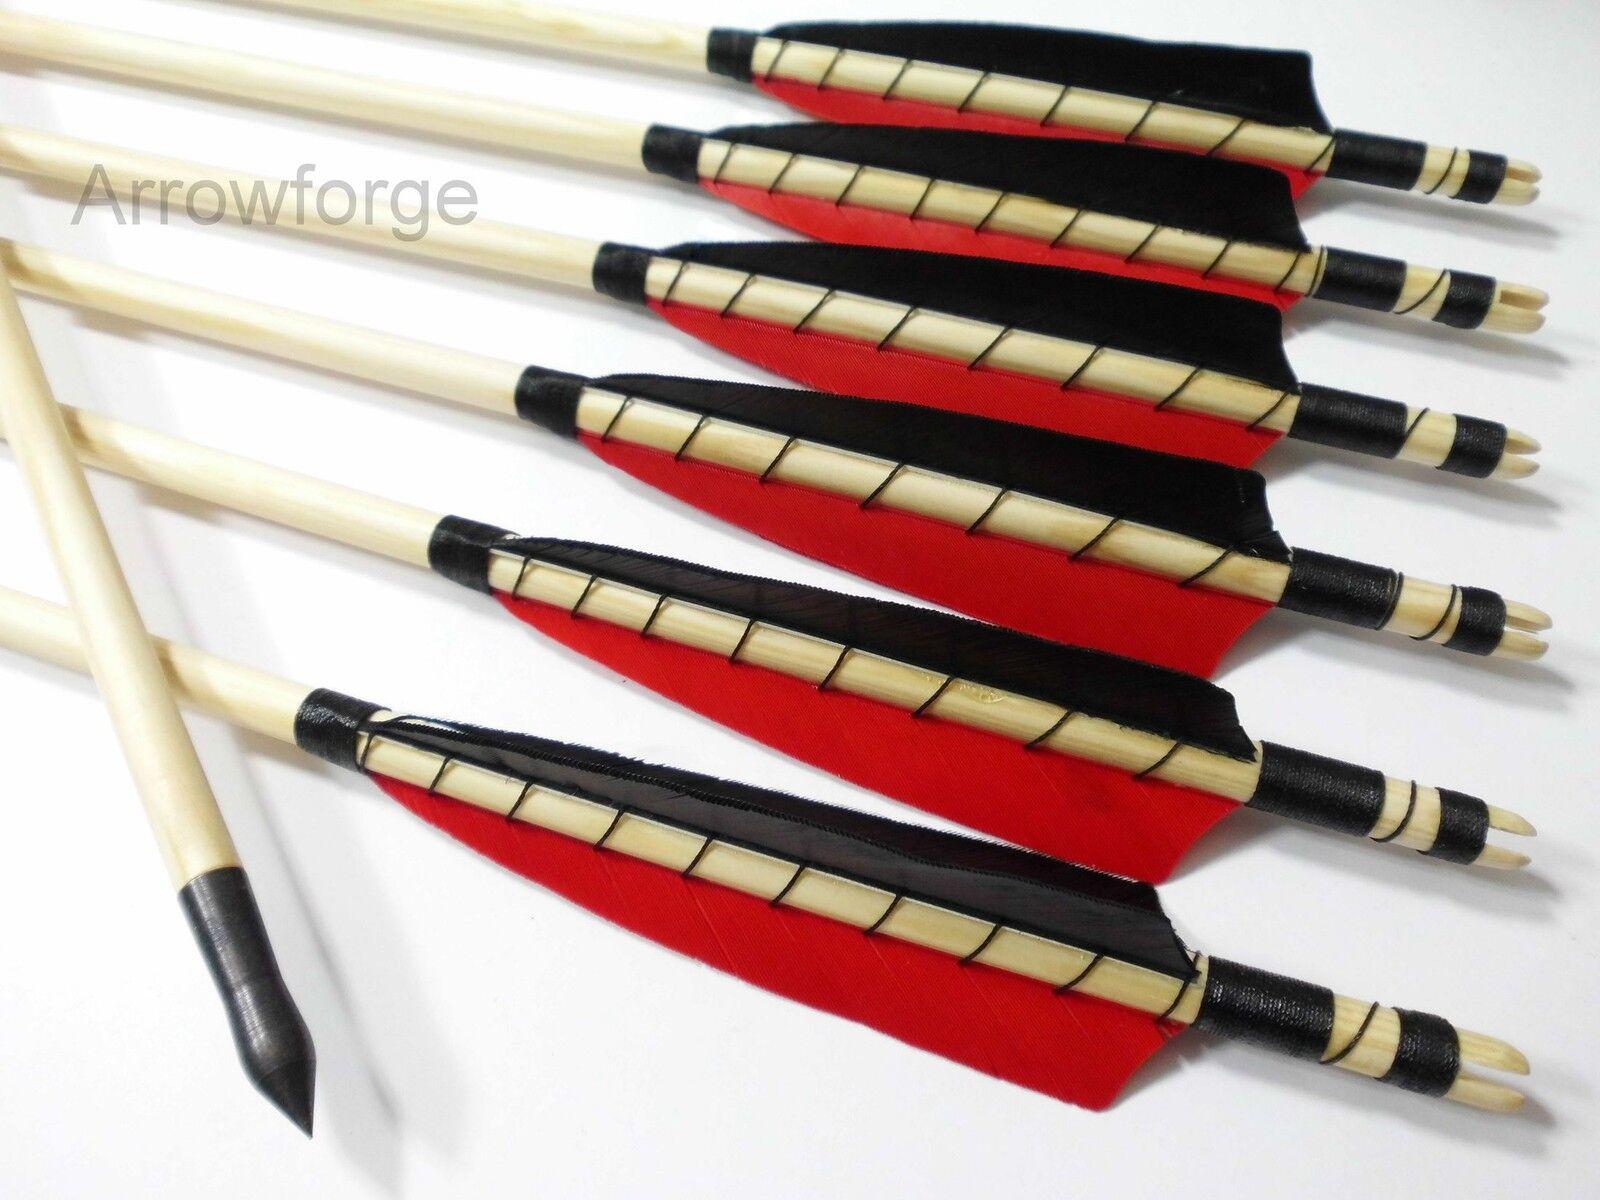 6 6 6 Holzpfeile  Langbogenpfeile Selfnock Pfeile traditionell 5  Shield Rot Schwarz 7706c0